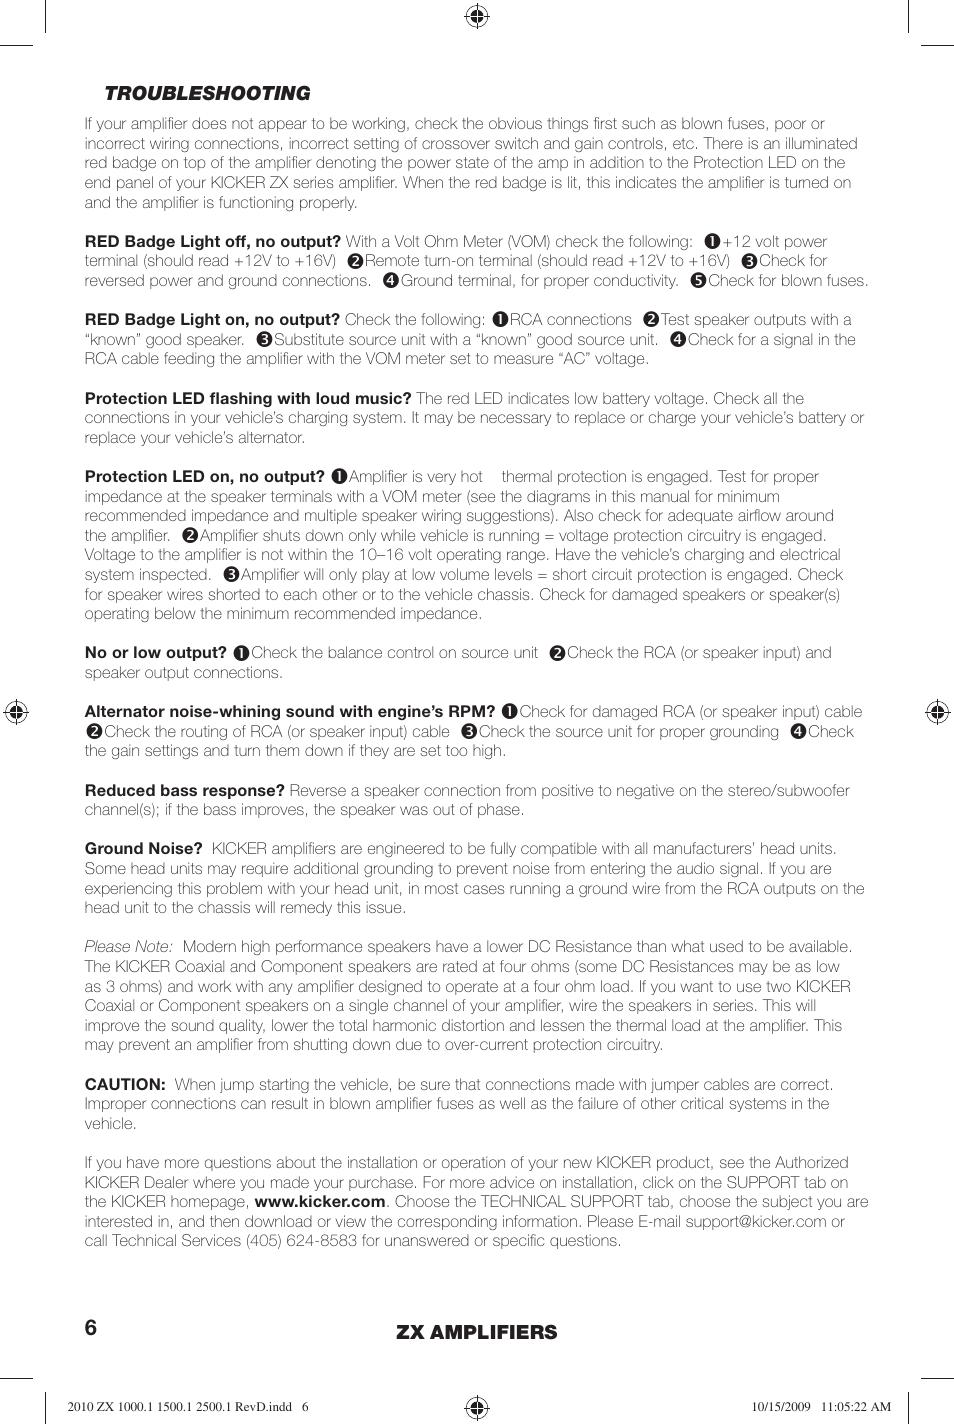 Kicker ZX2500 1 EU User Manual | Page 6 / 28 | Also for: ZX1500 1 EU